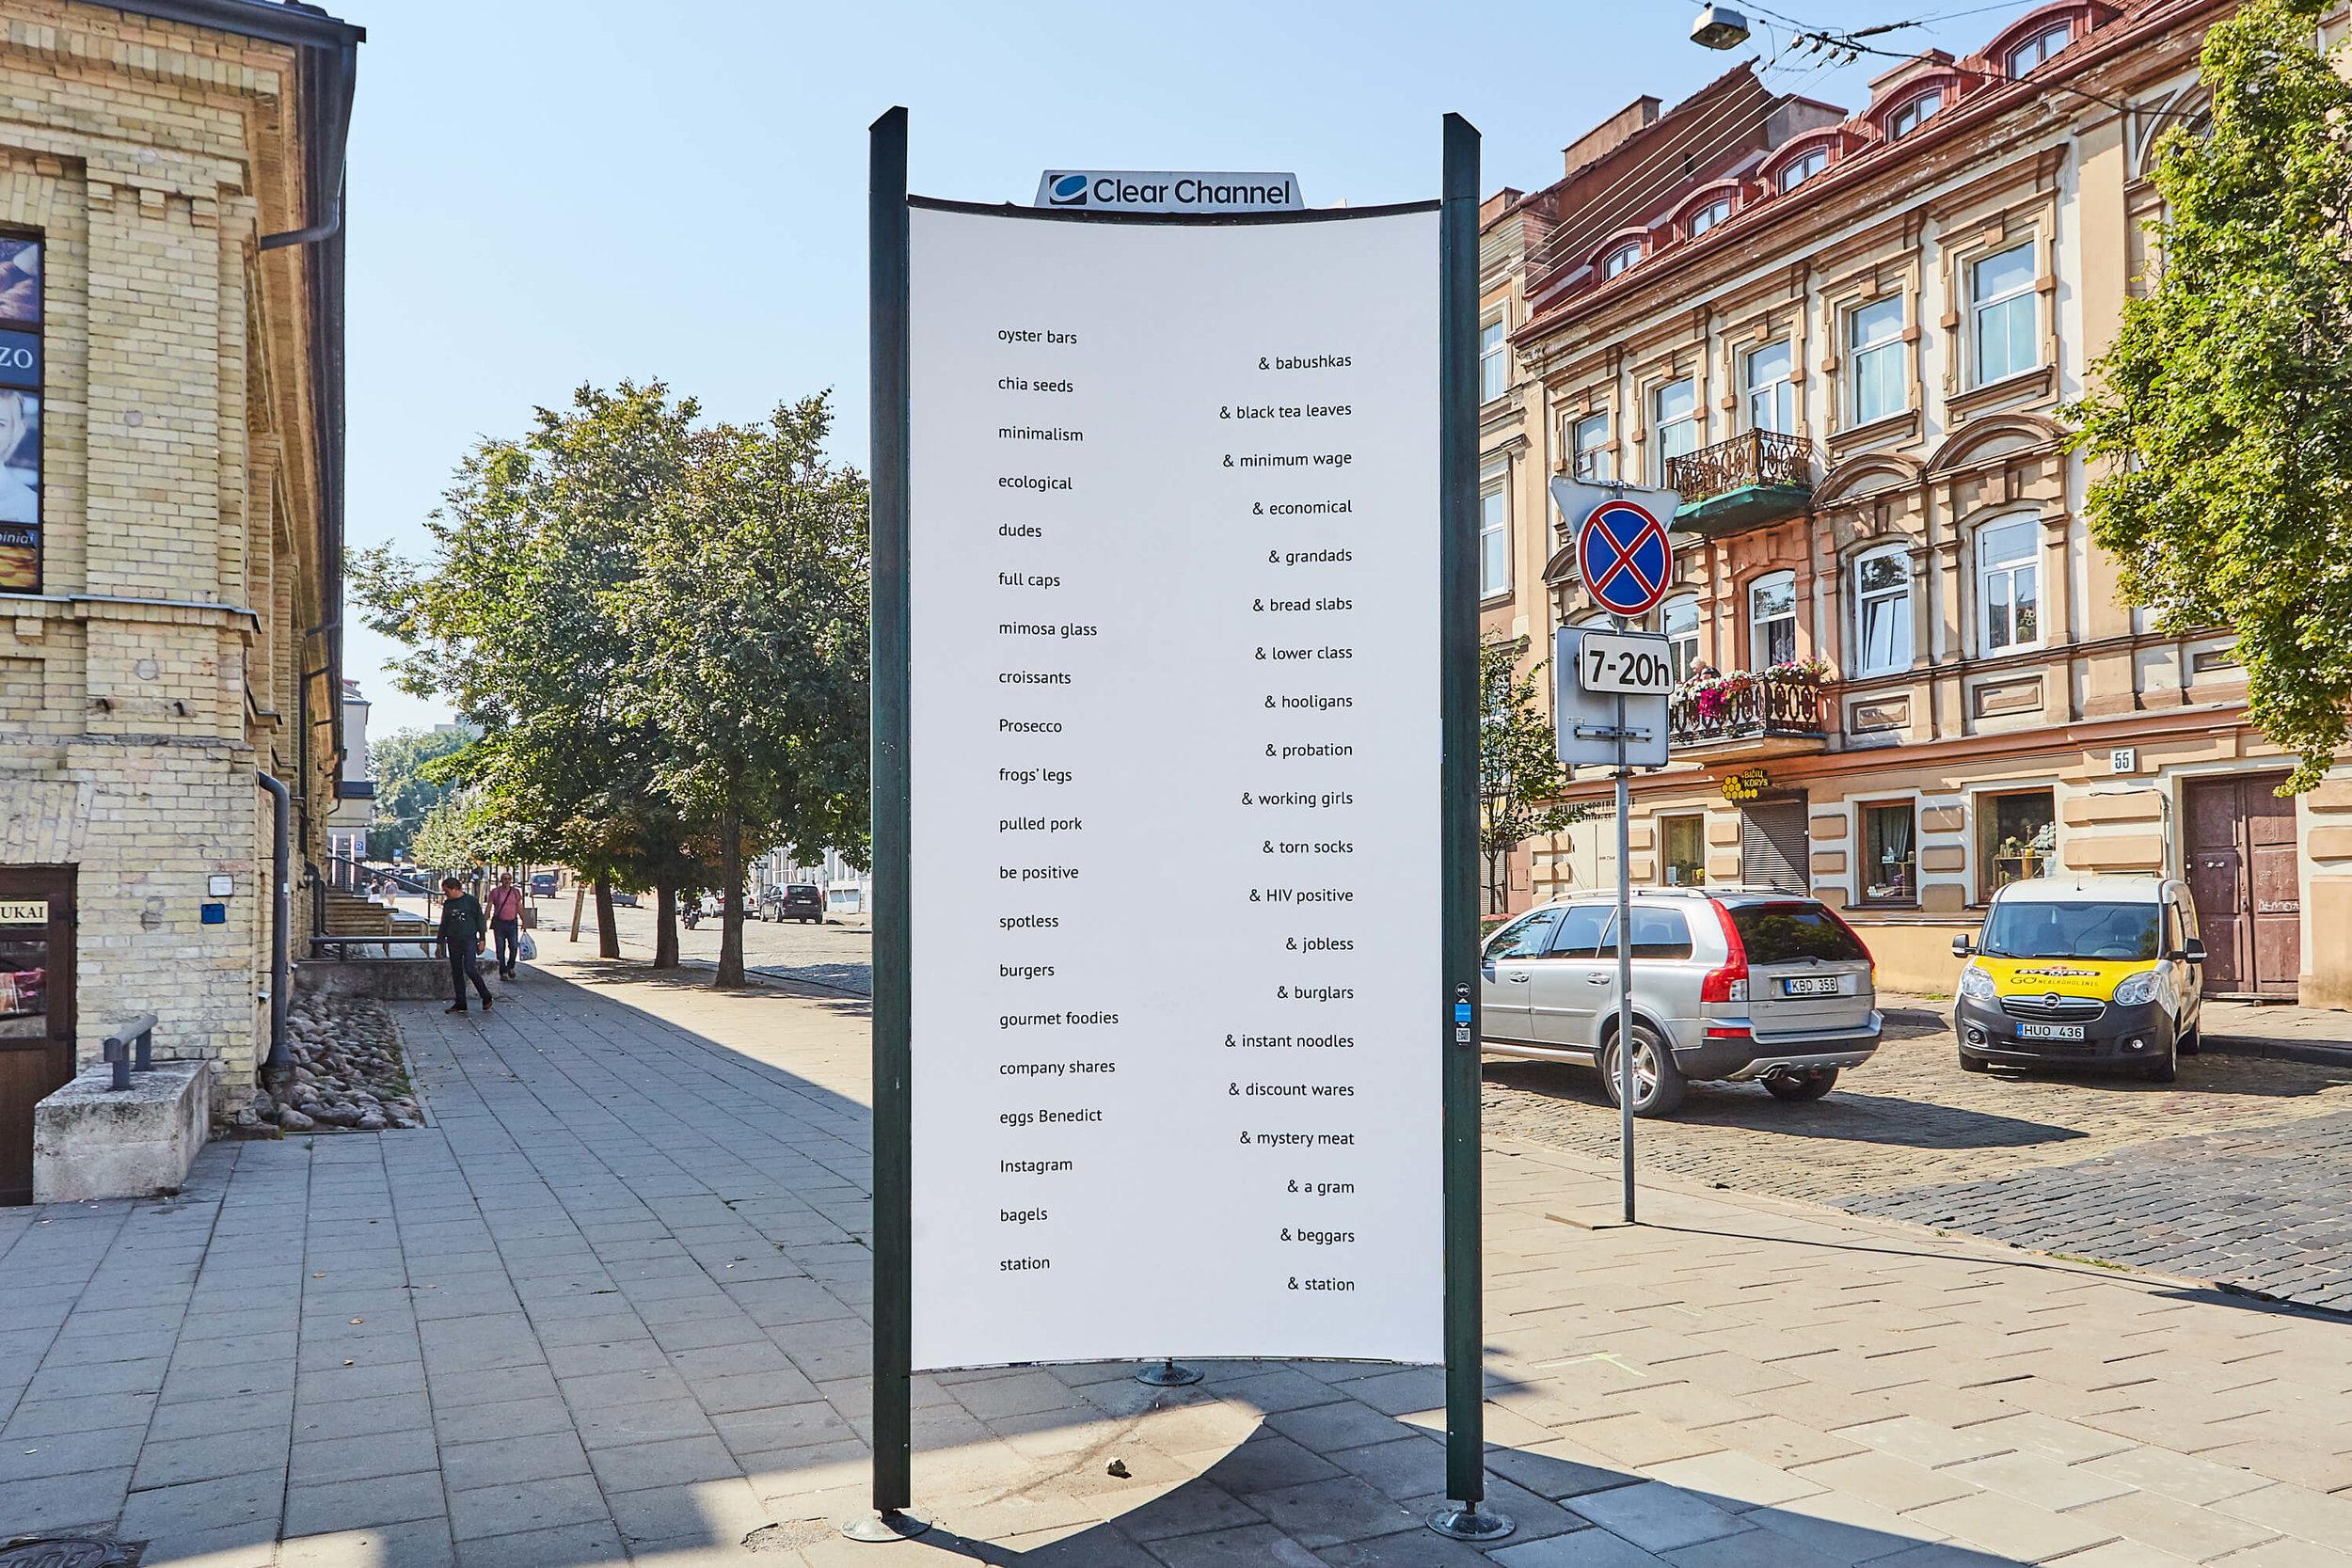 Julius_Markevičius_VK'19.jpg